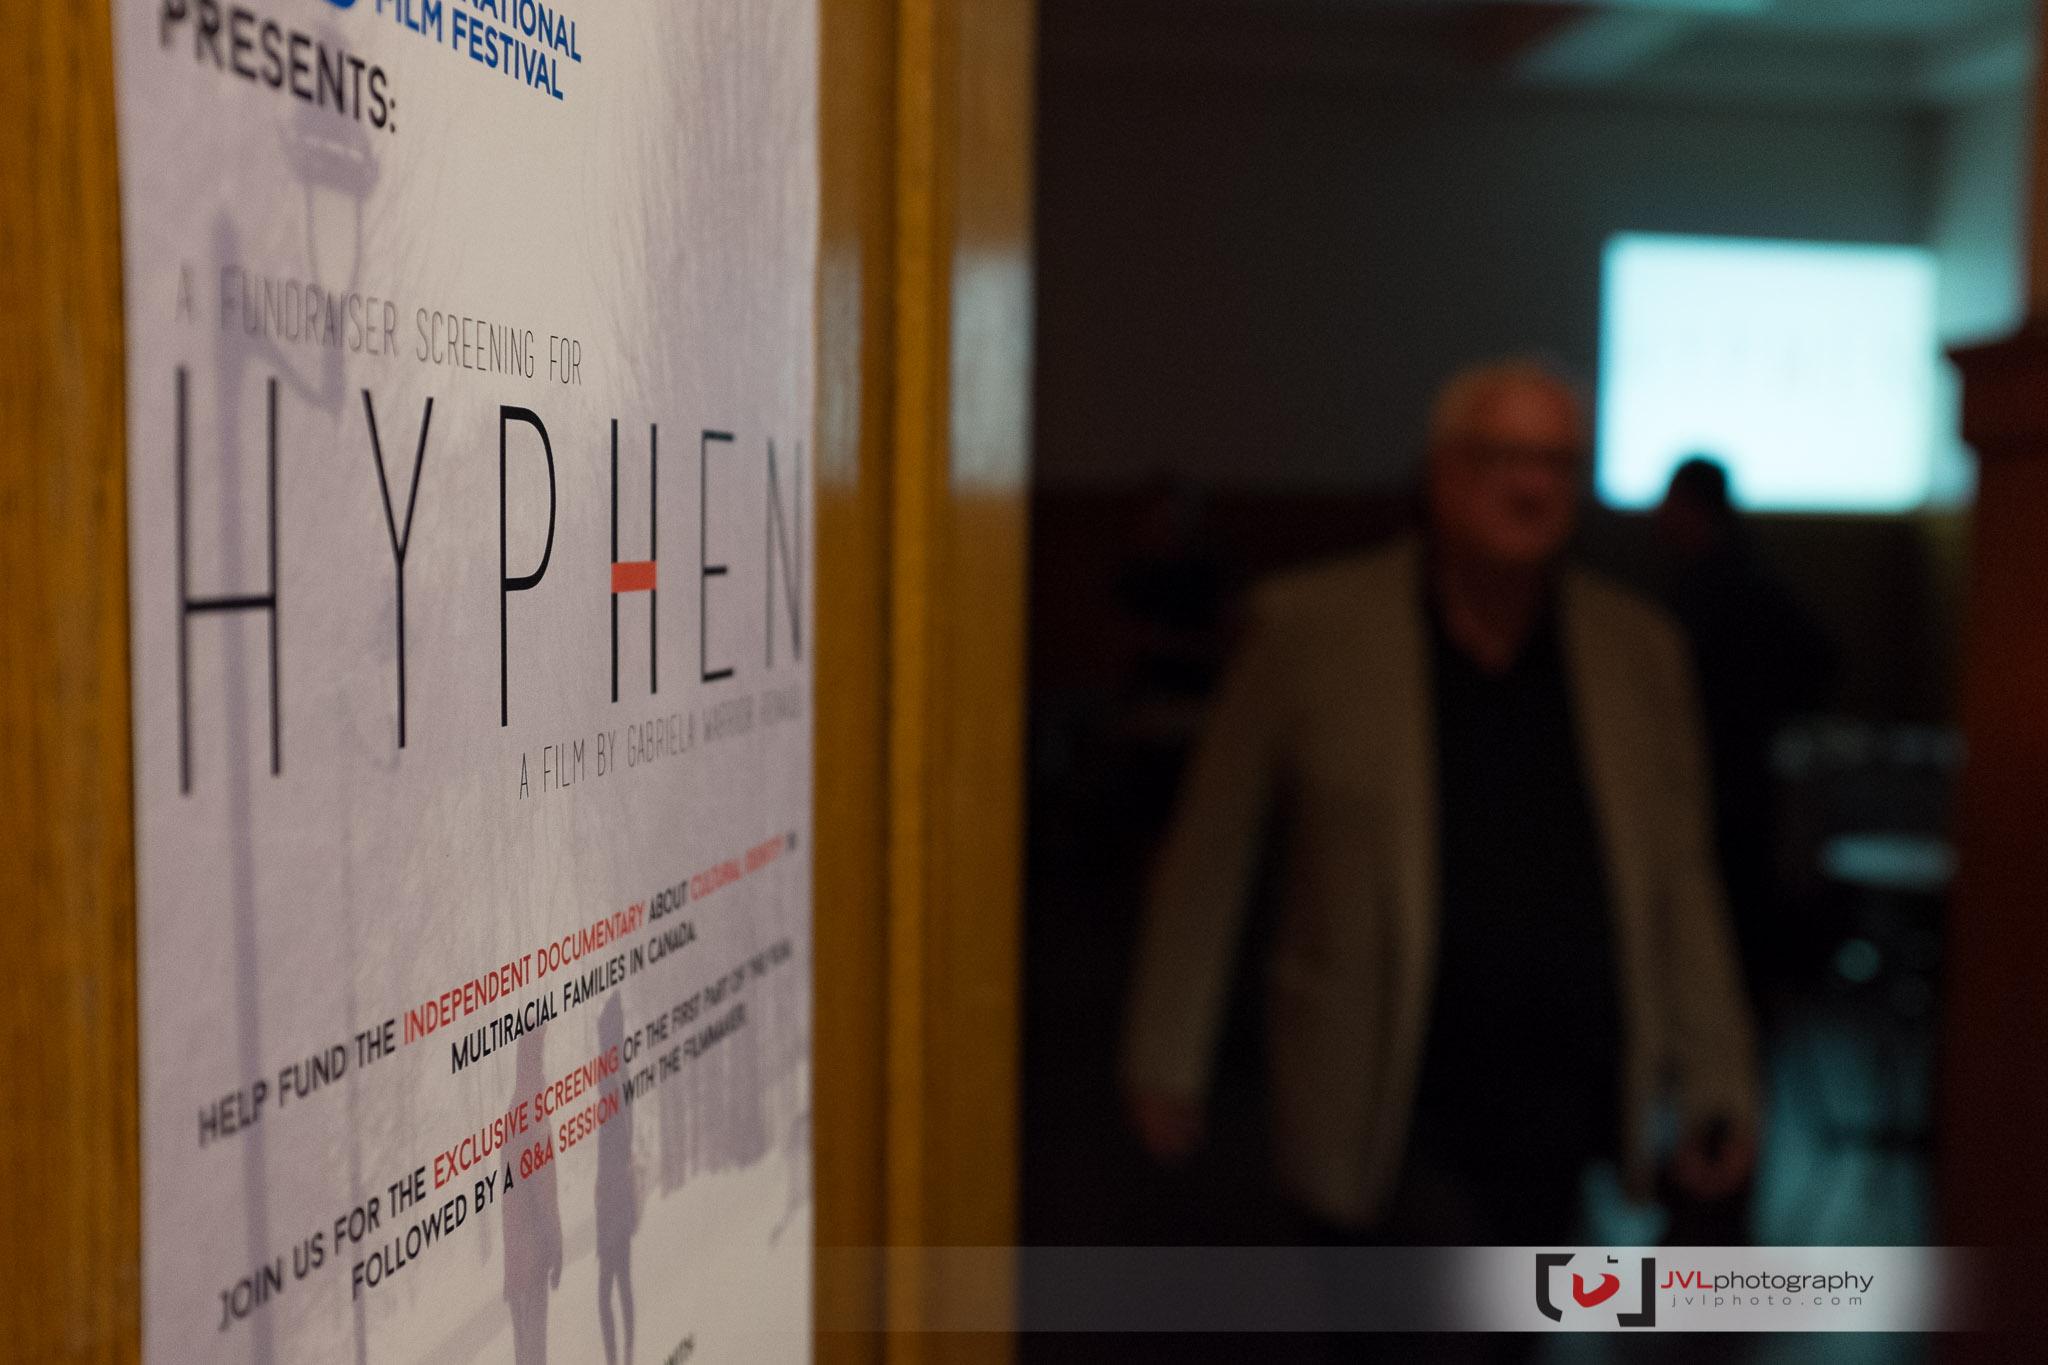 Hyphen-7-JVLphoto.jpg